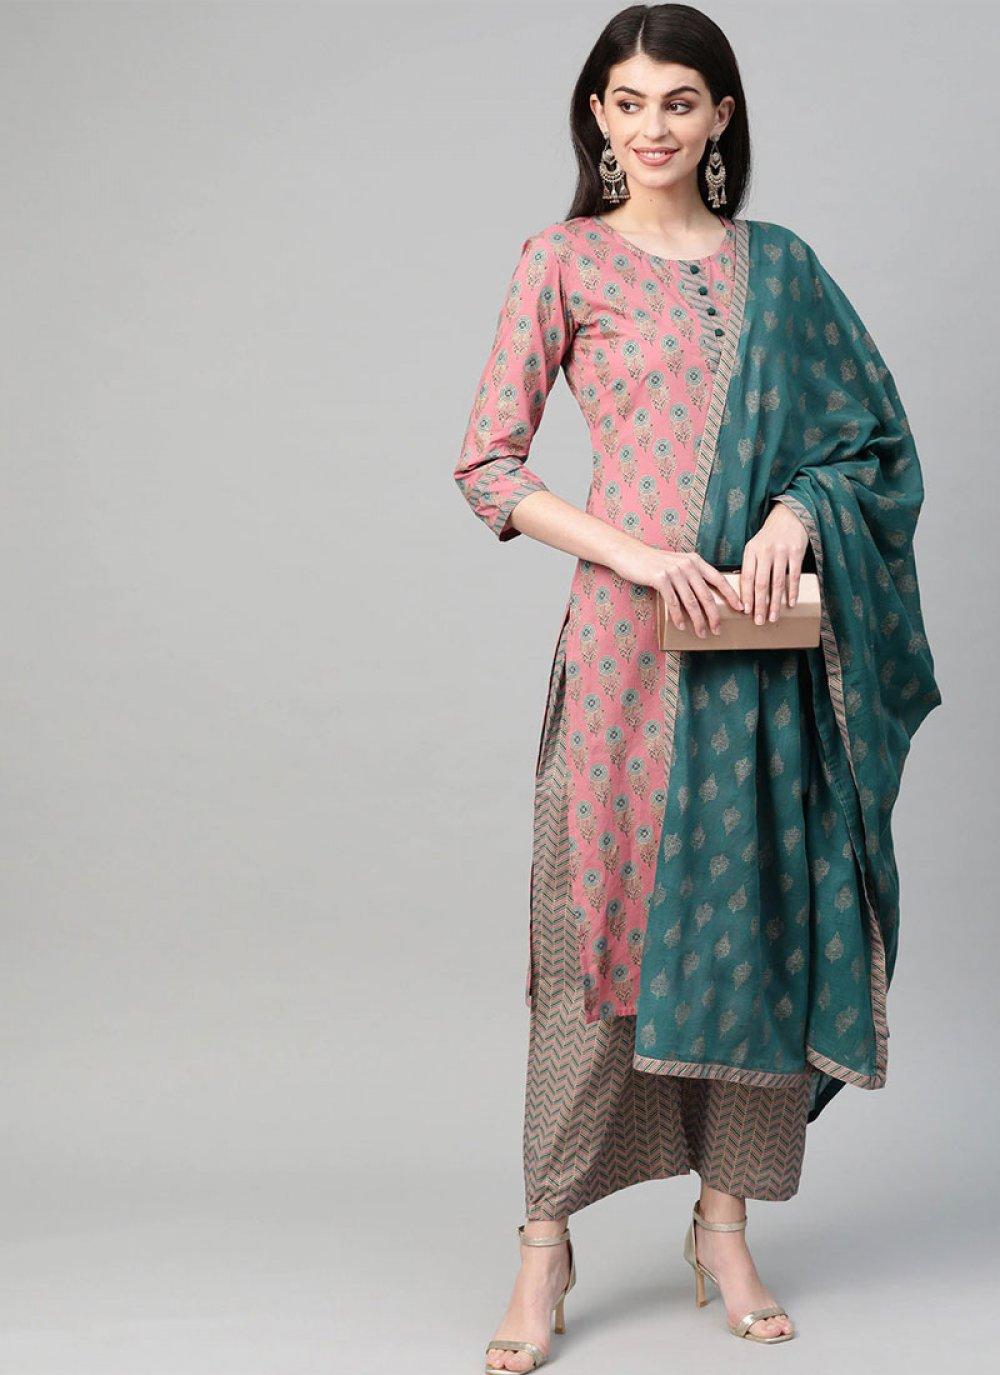 Cotton Printed Salwar Kameez in Green and Pink